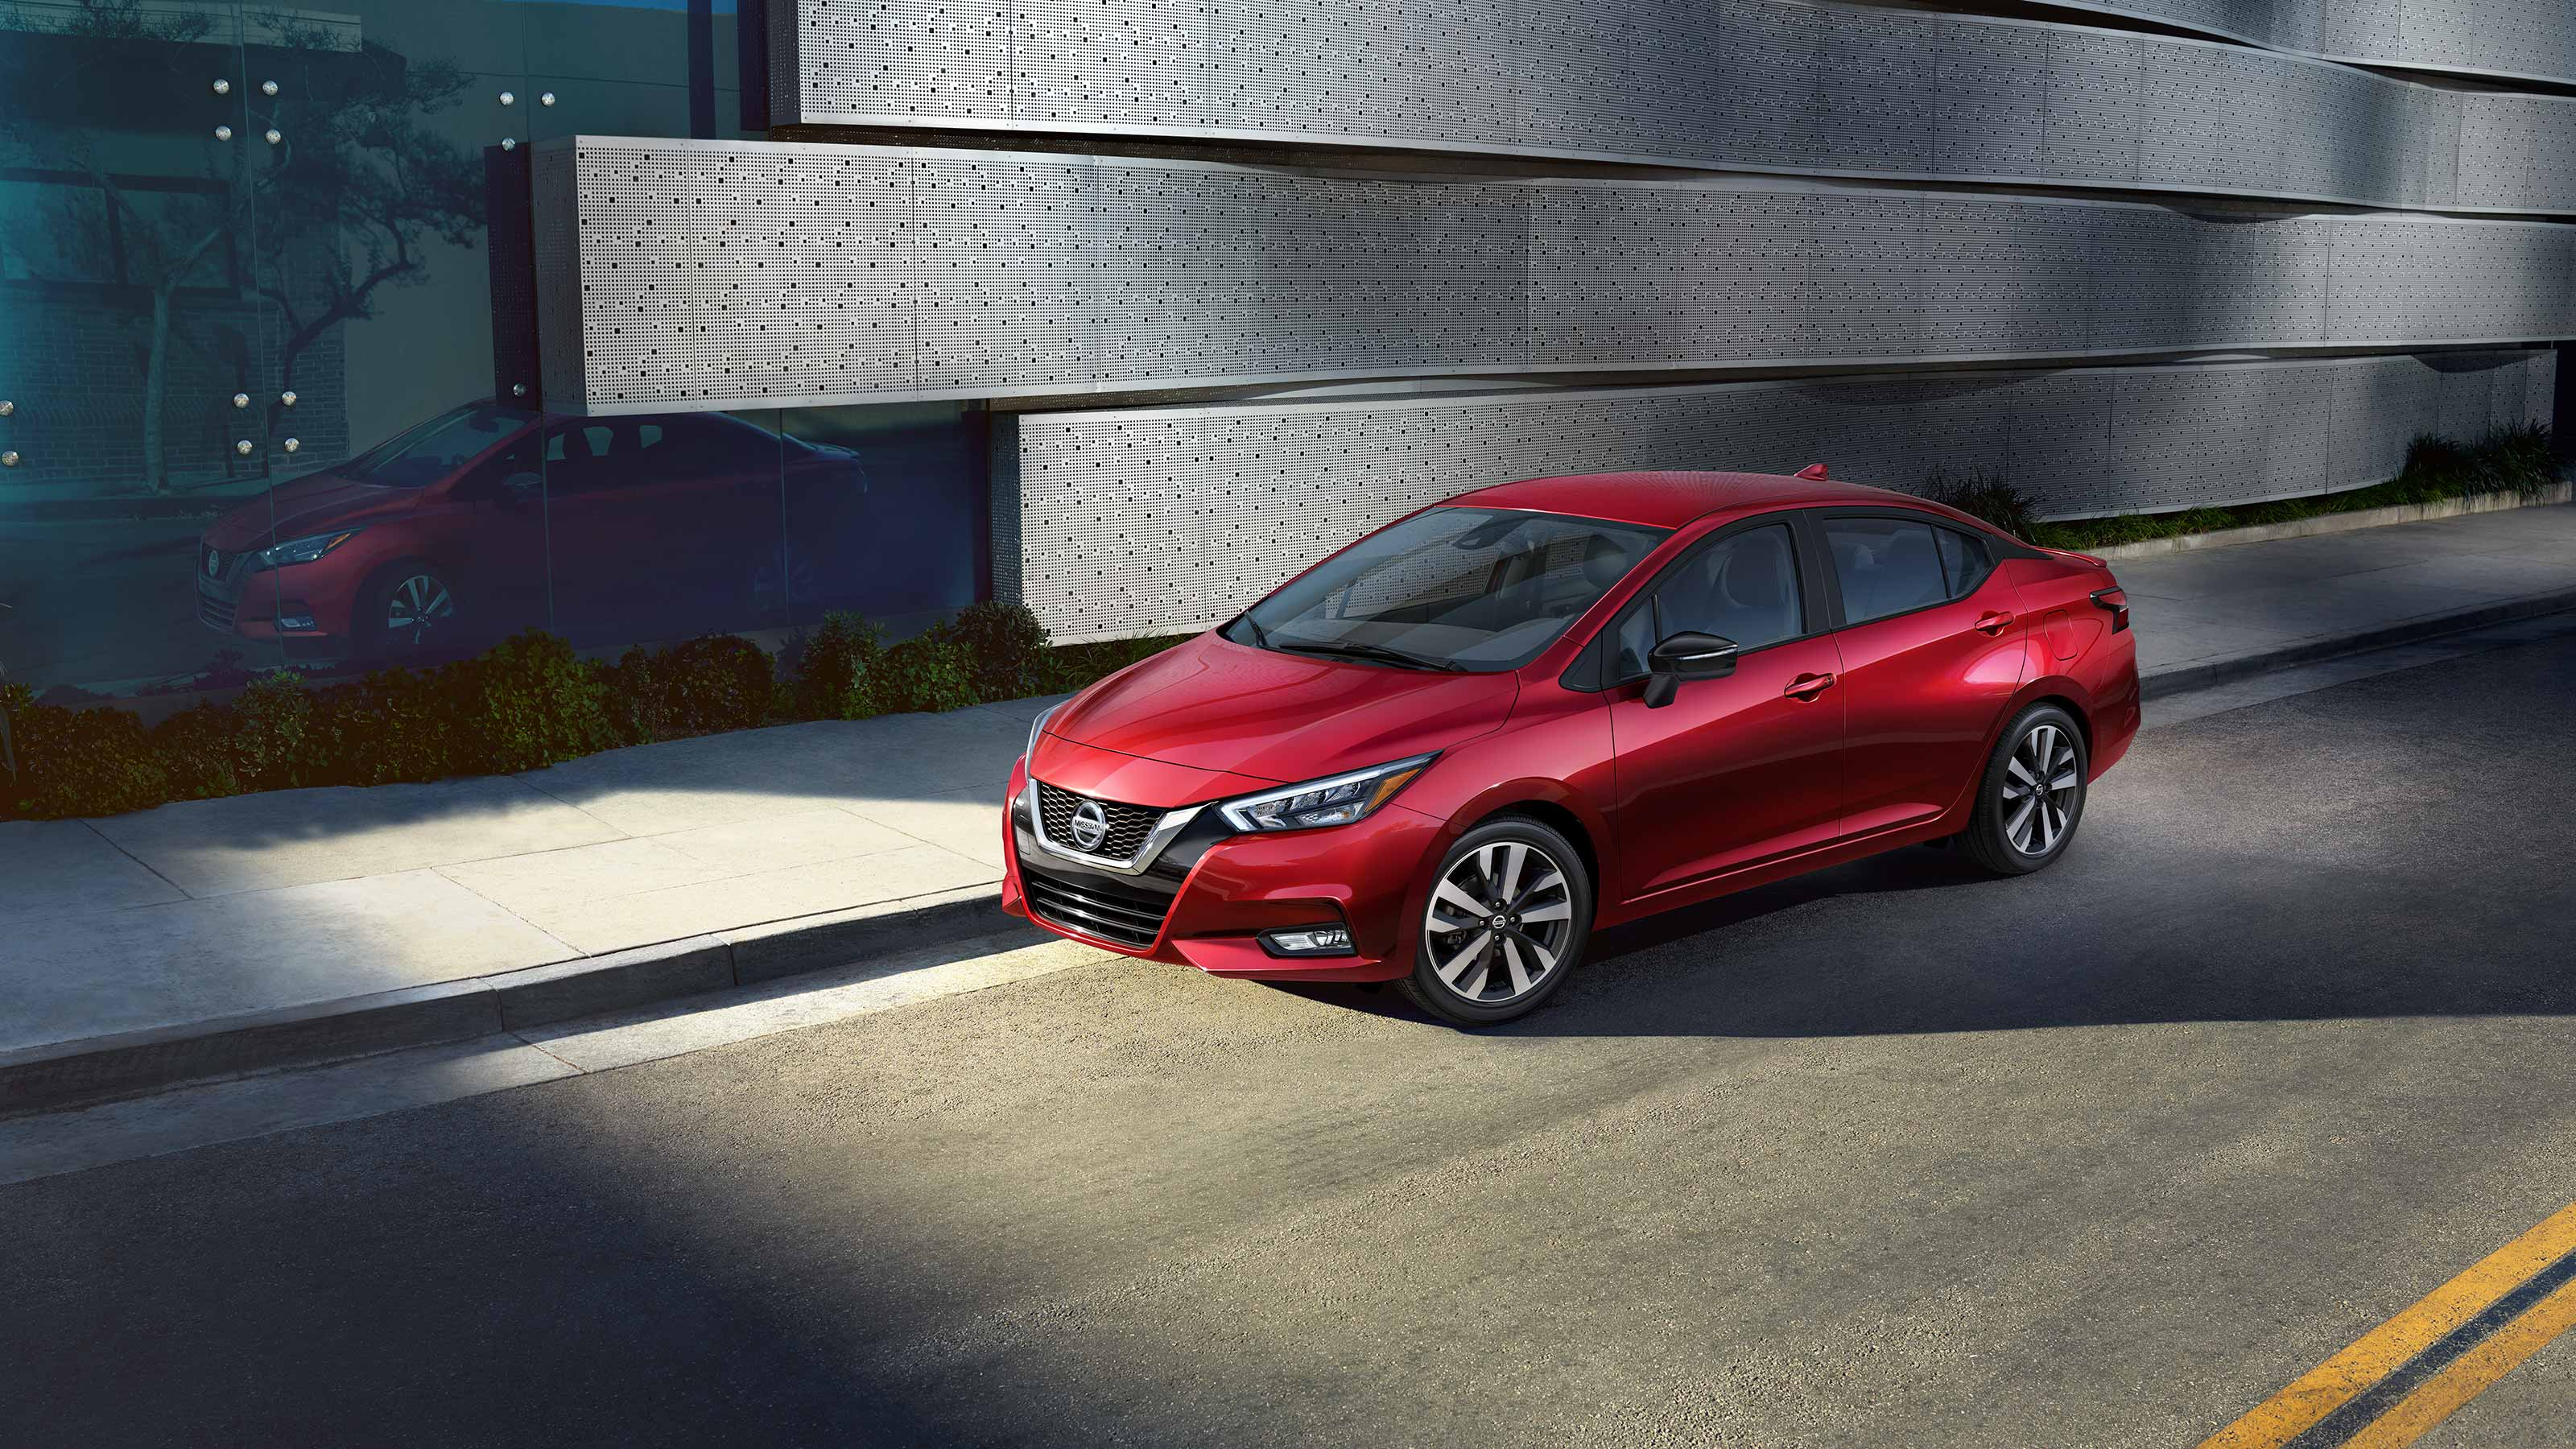 2020 Nissan Versa vs 2020 Hyundai Accent near Sacramento, CA